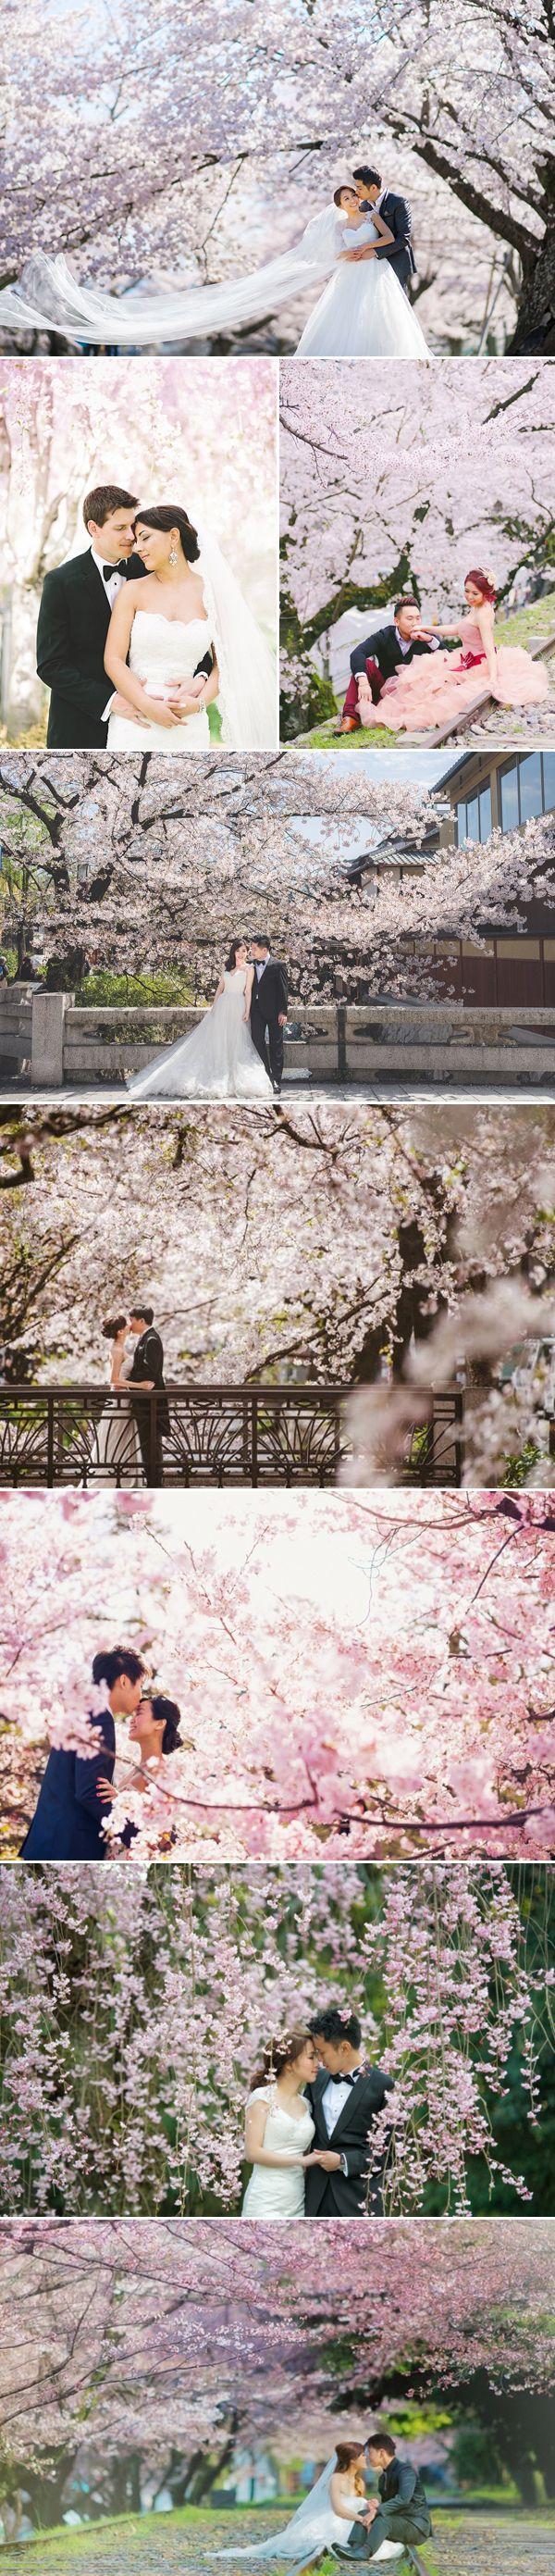 Mariage - 25 Stunning Cherry Blossom Wedding Photos You Will Love